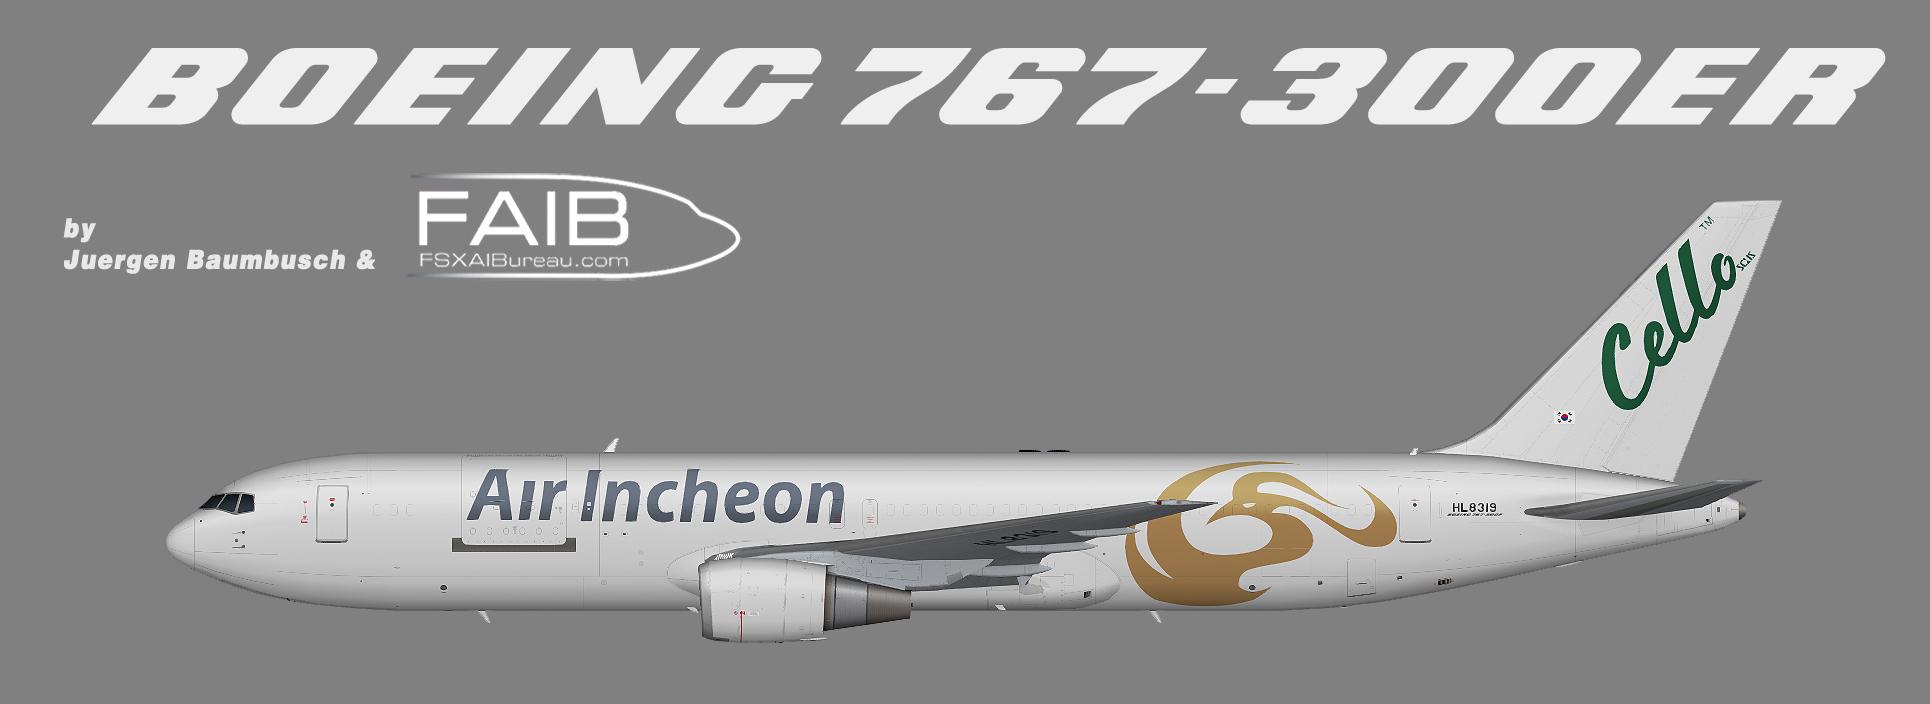 Air Incheon Boeing 767-300F